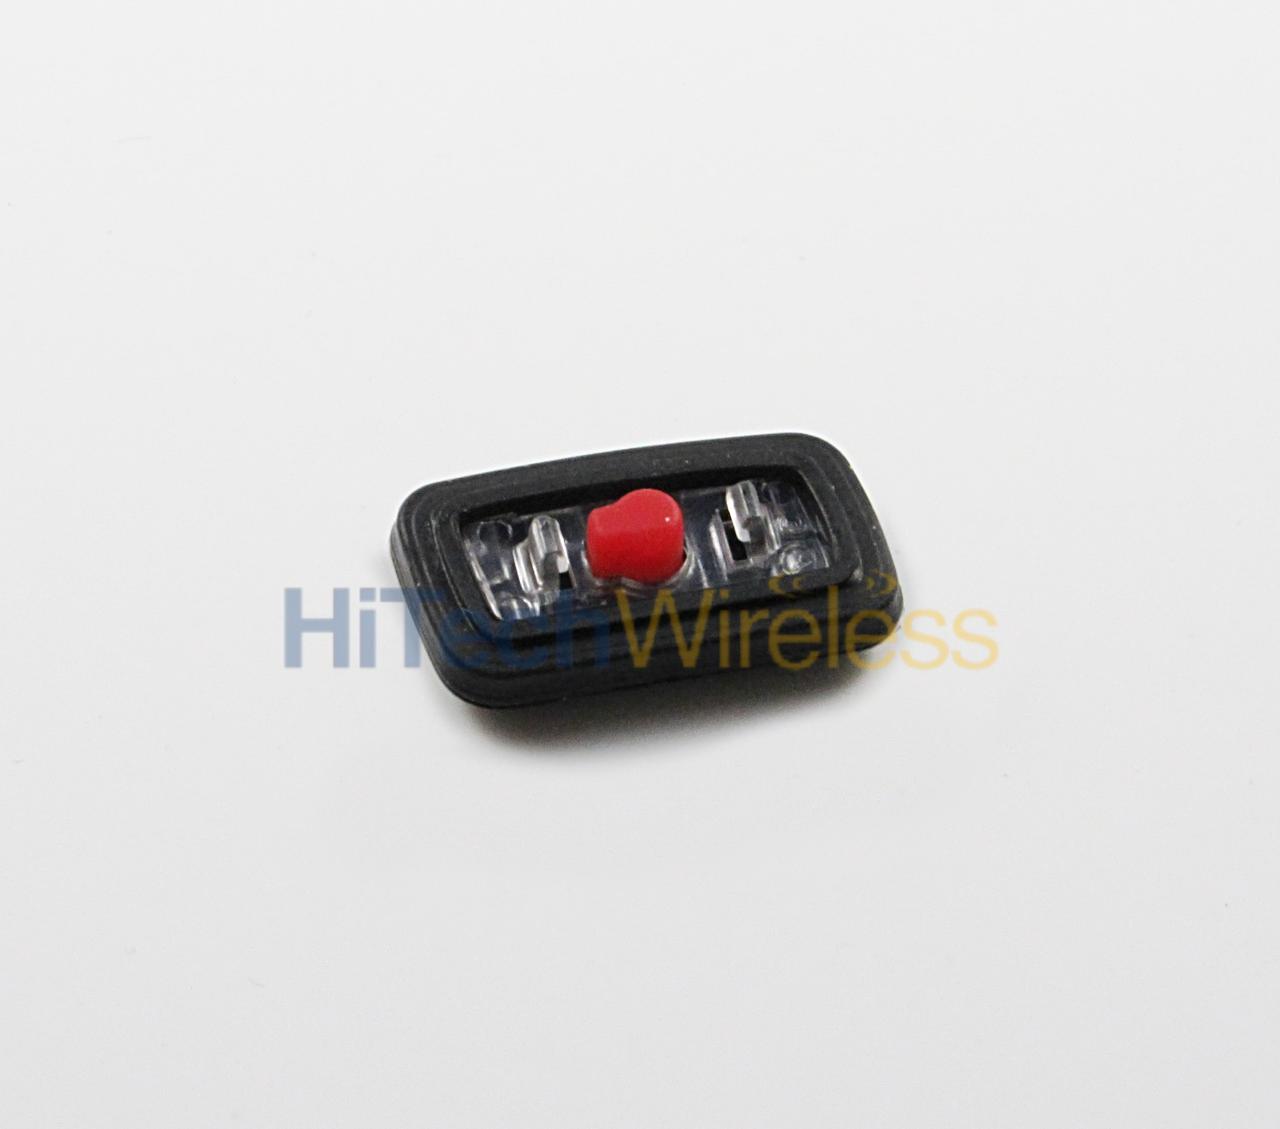 Motorola//Vertex Standard PTT Assembly for VX-261-VX-264 CB7131000